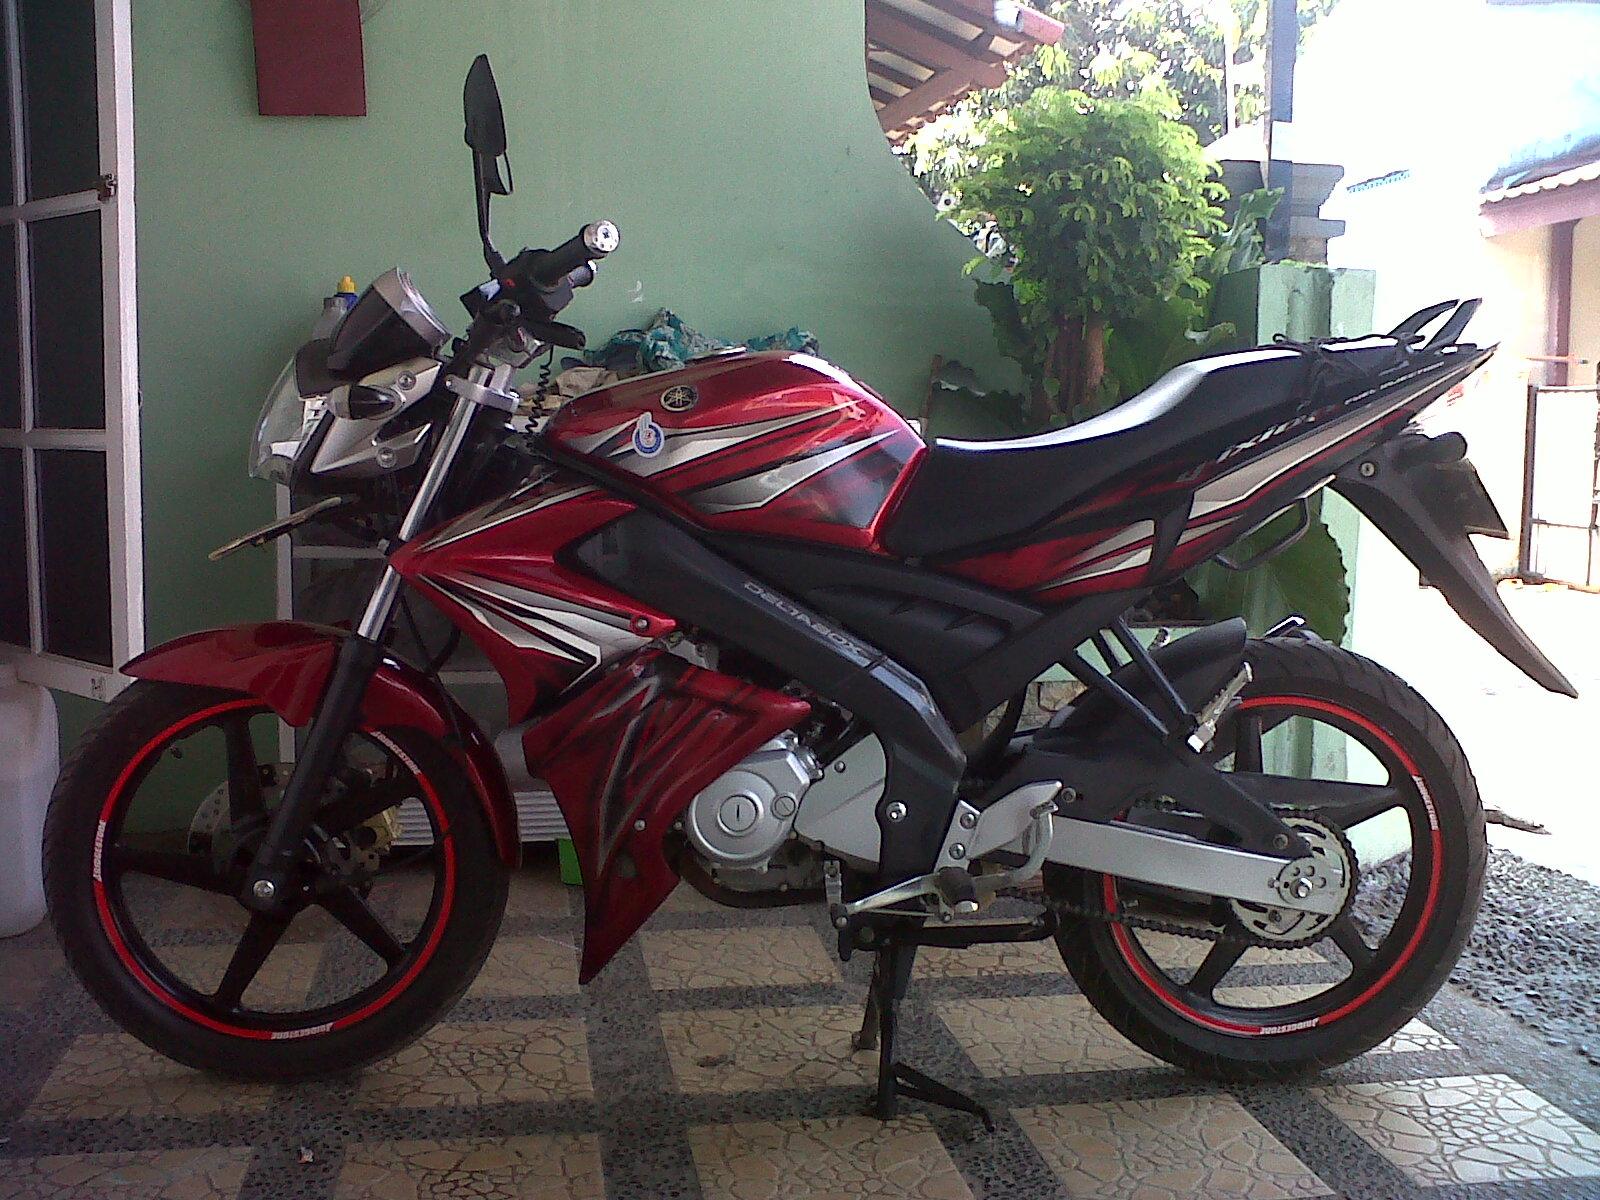 Inspiration For MotorCycles Ukuran Ban Belakang Tubeless Yang